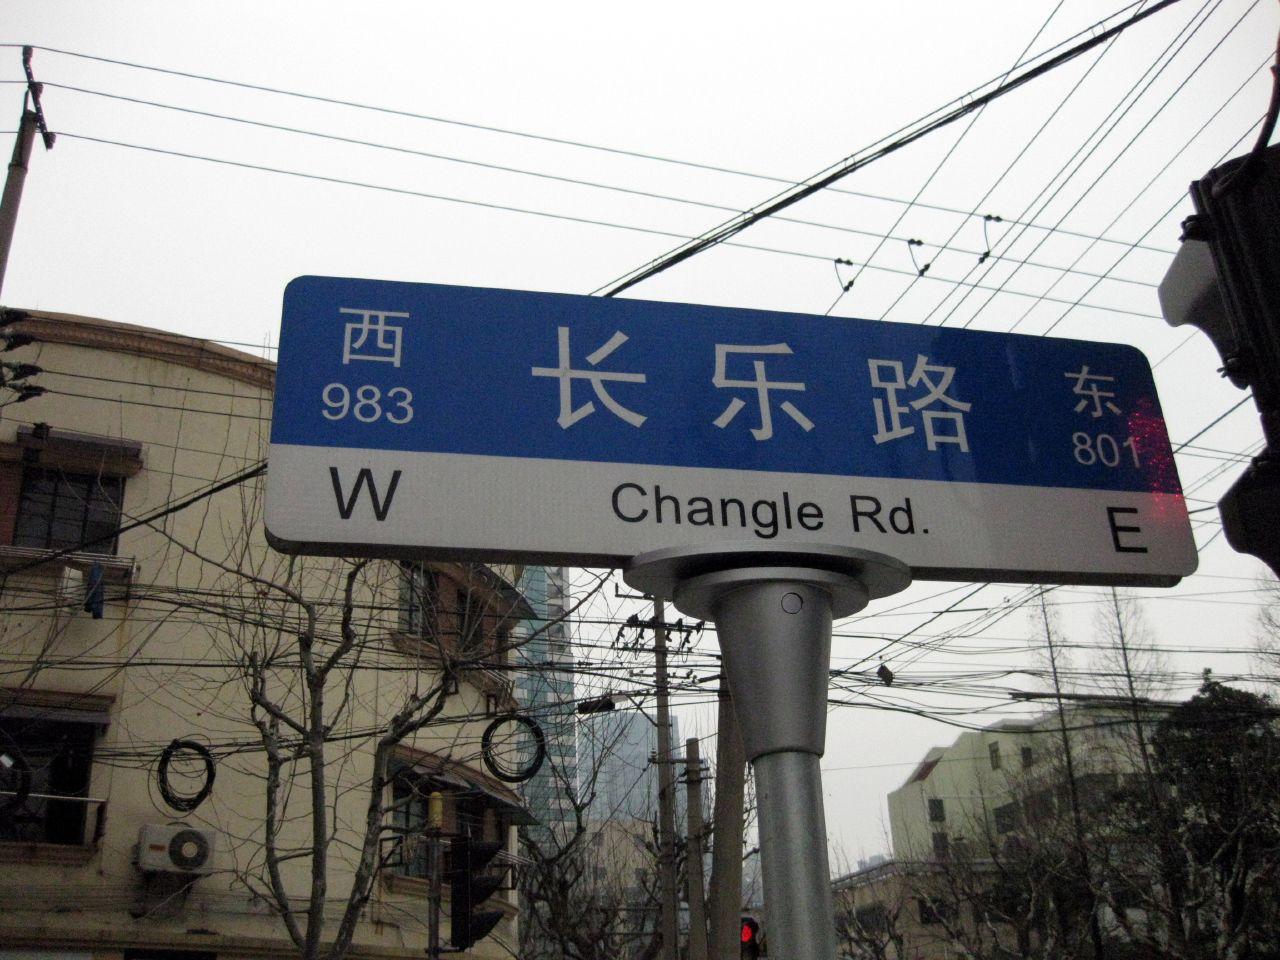 Changle Road